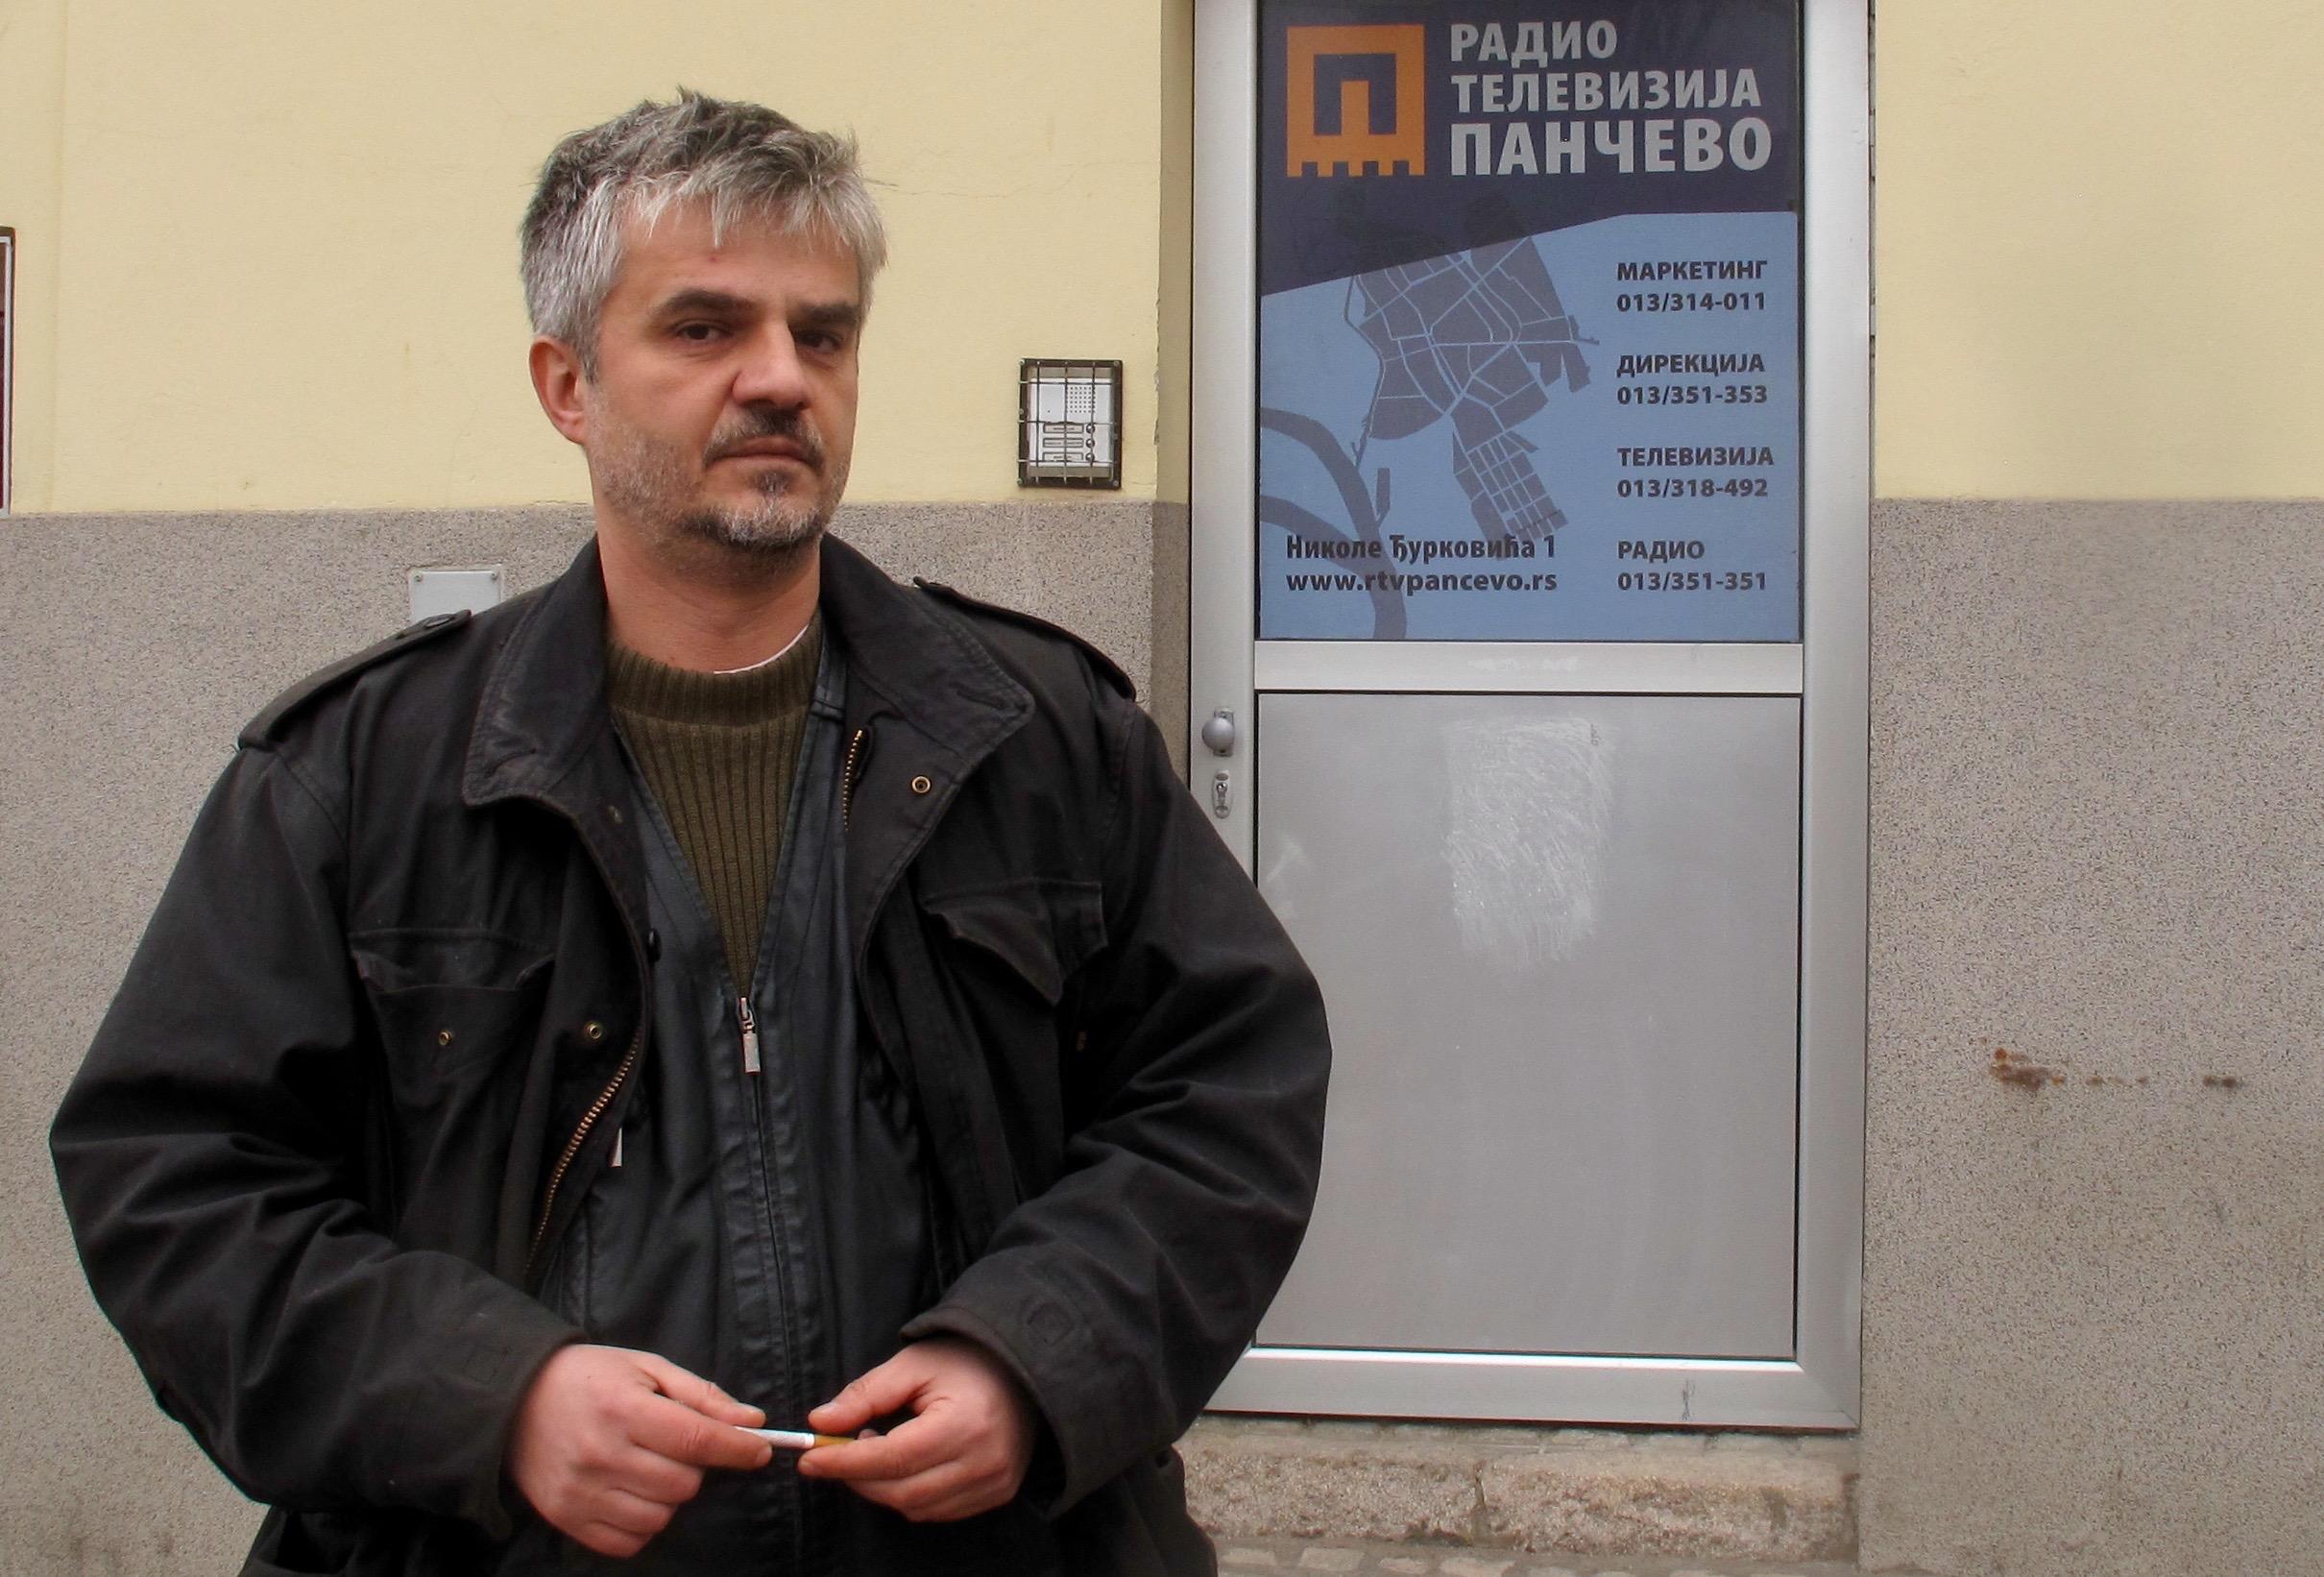 Vladimir_Djokovic_RTV_Pancevo